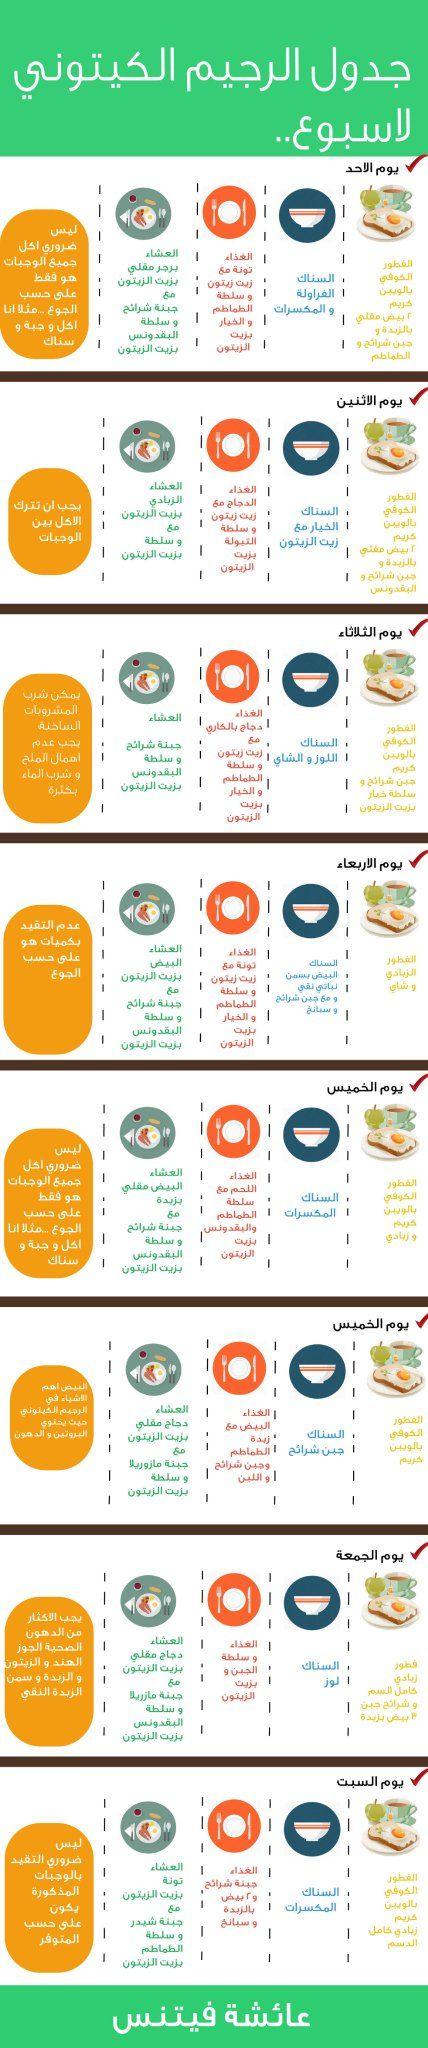 جدول كيتو بحث في تويتر Keto Diet Food List Keto Diet Recipes Keto Diet Menu